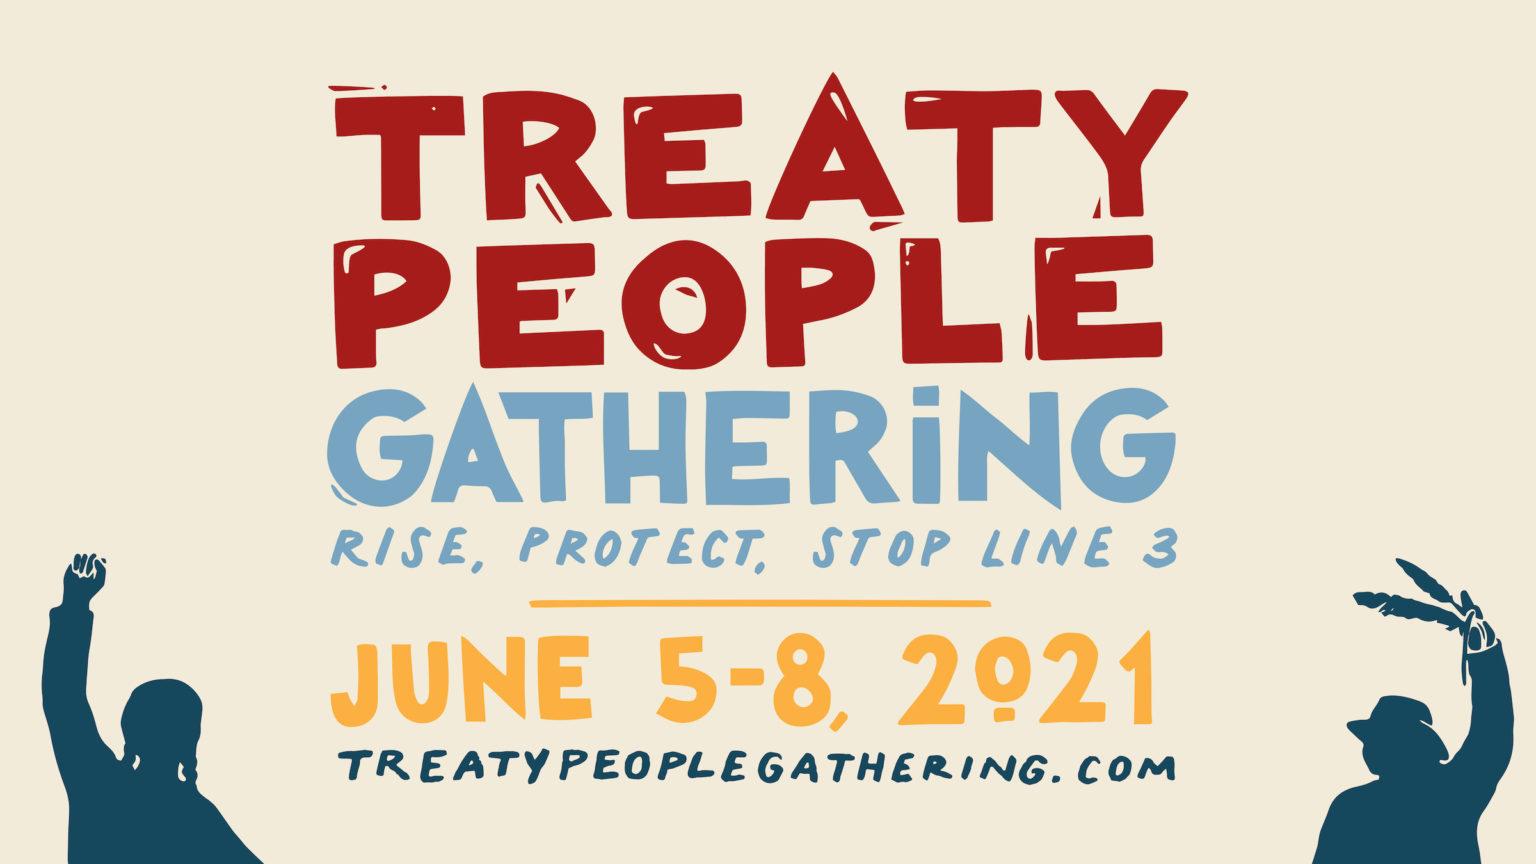 treaty people gathering